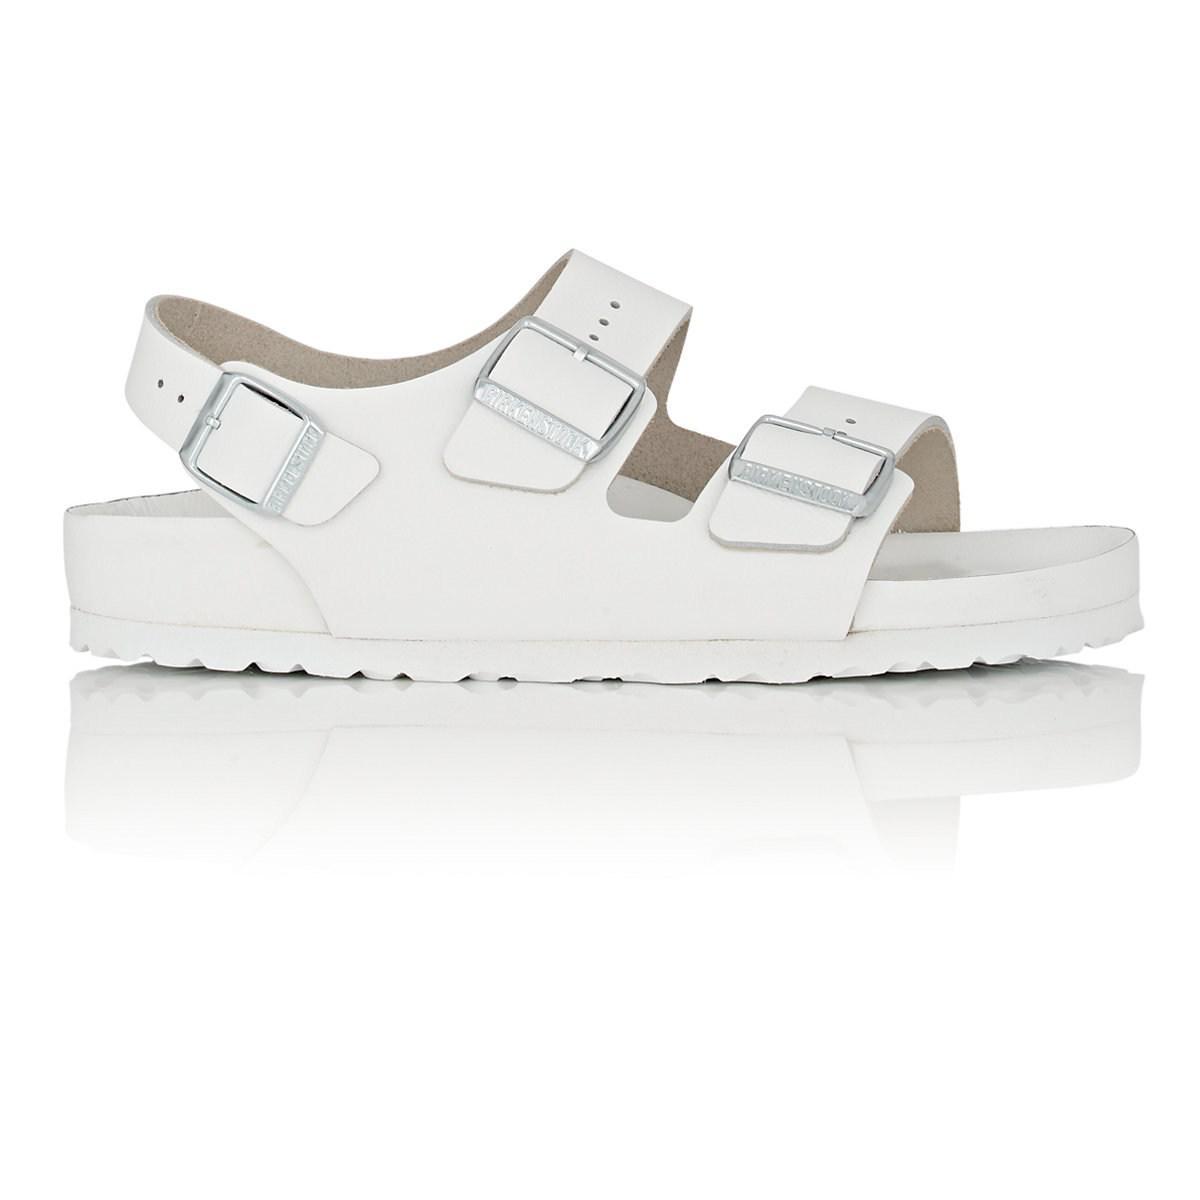 Birkenstock Milano Leather All White Sandals